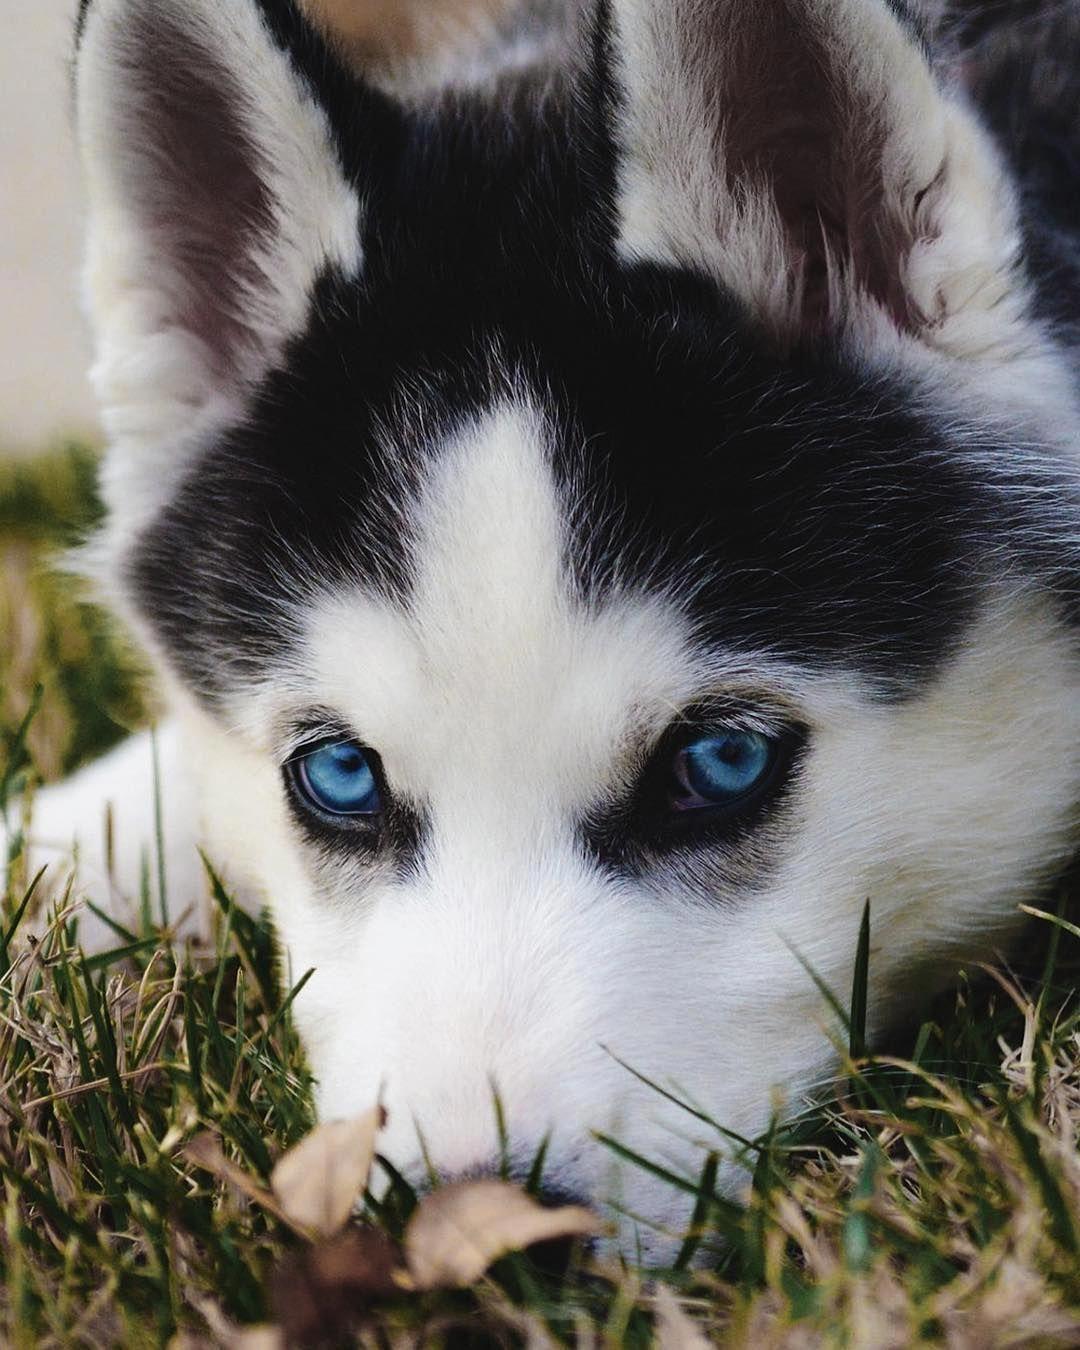 Husky Lovers Husky Lovers Owners Instagram Posts Videos Stories On Webstaqram Com Siberian Husky Husky Wolf Dog Puppy